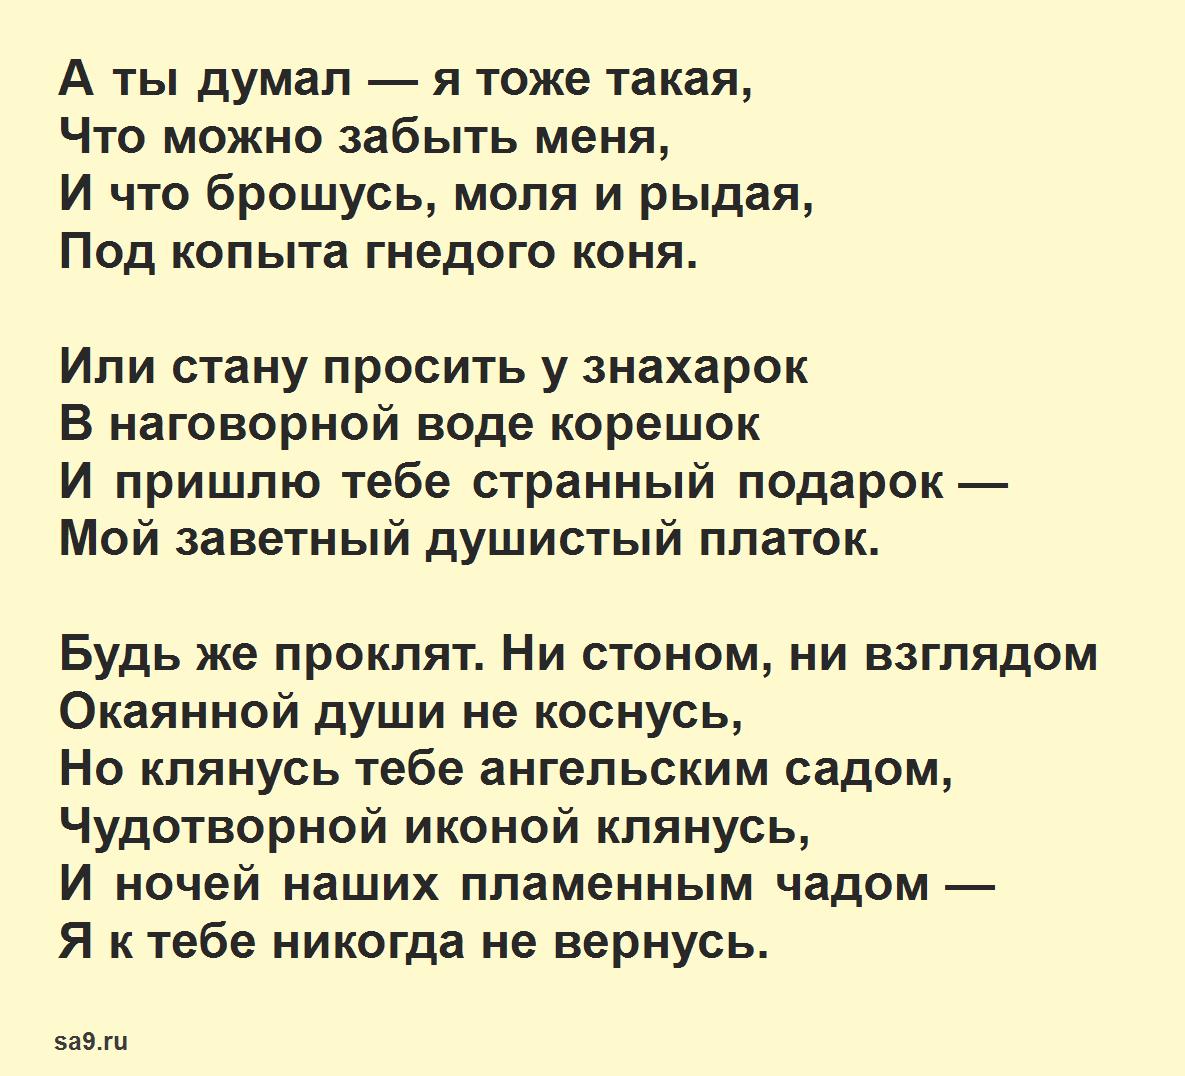 Ахматова стихи о любви к мужчине - А ты думал - я тоже такая